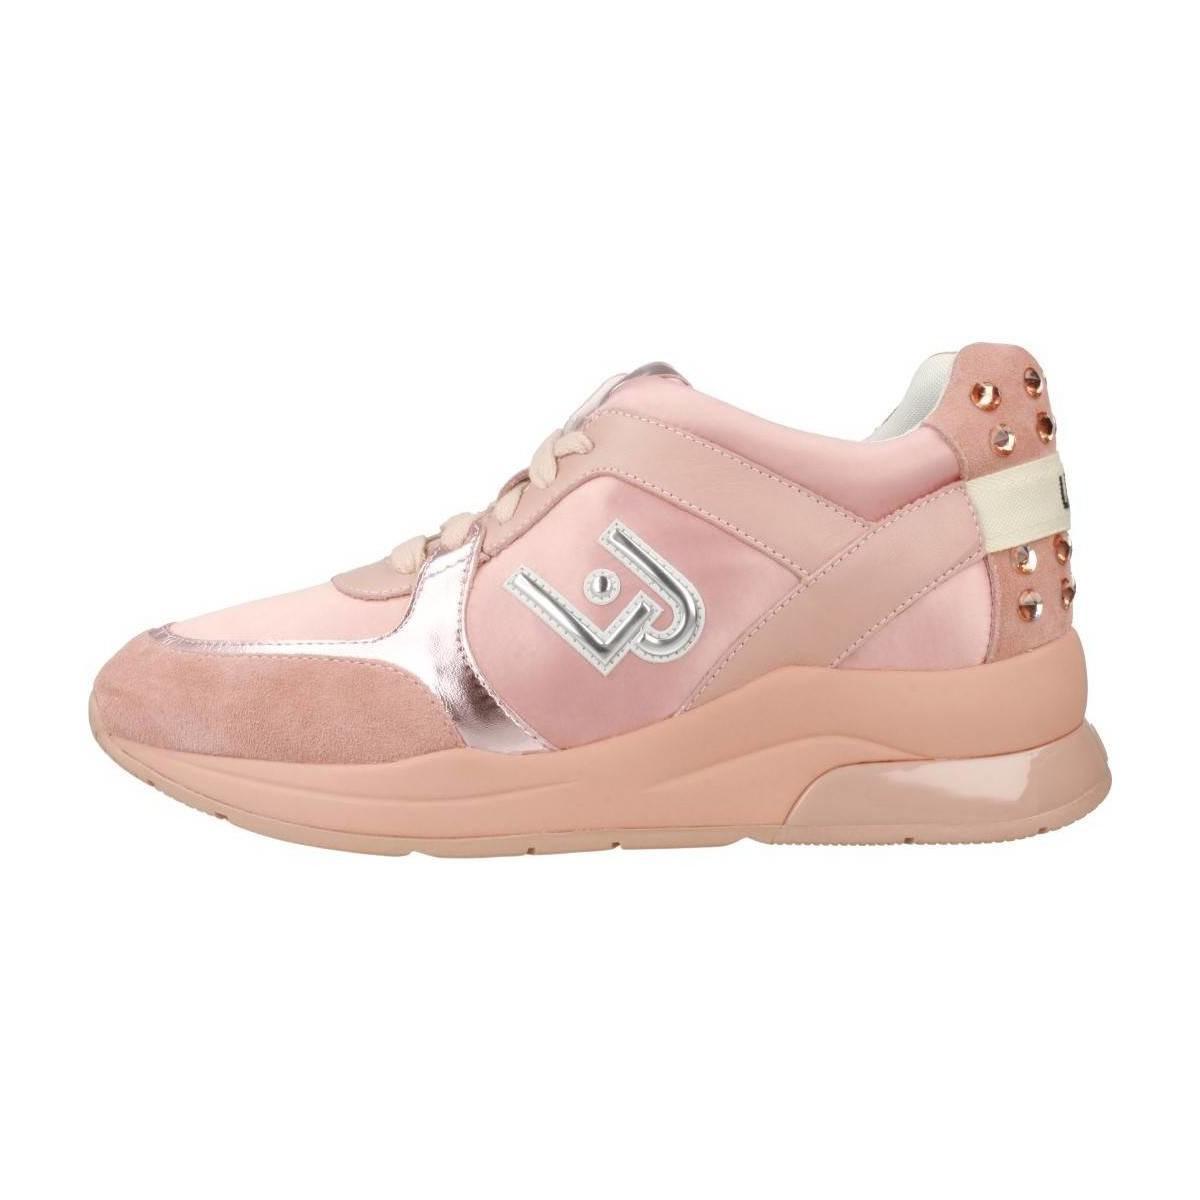 Liu Jo Running Miranda Women s Shoes (trainers) In Pink in Pink - Lyst 5015d41640e